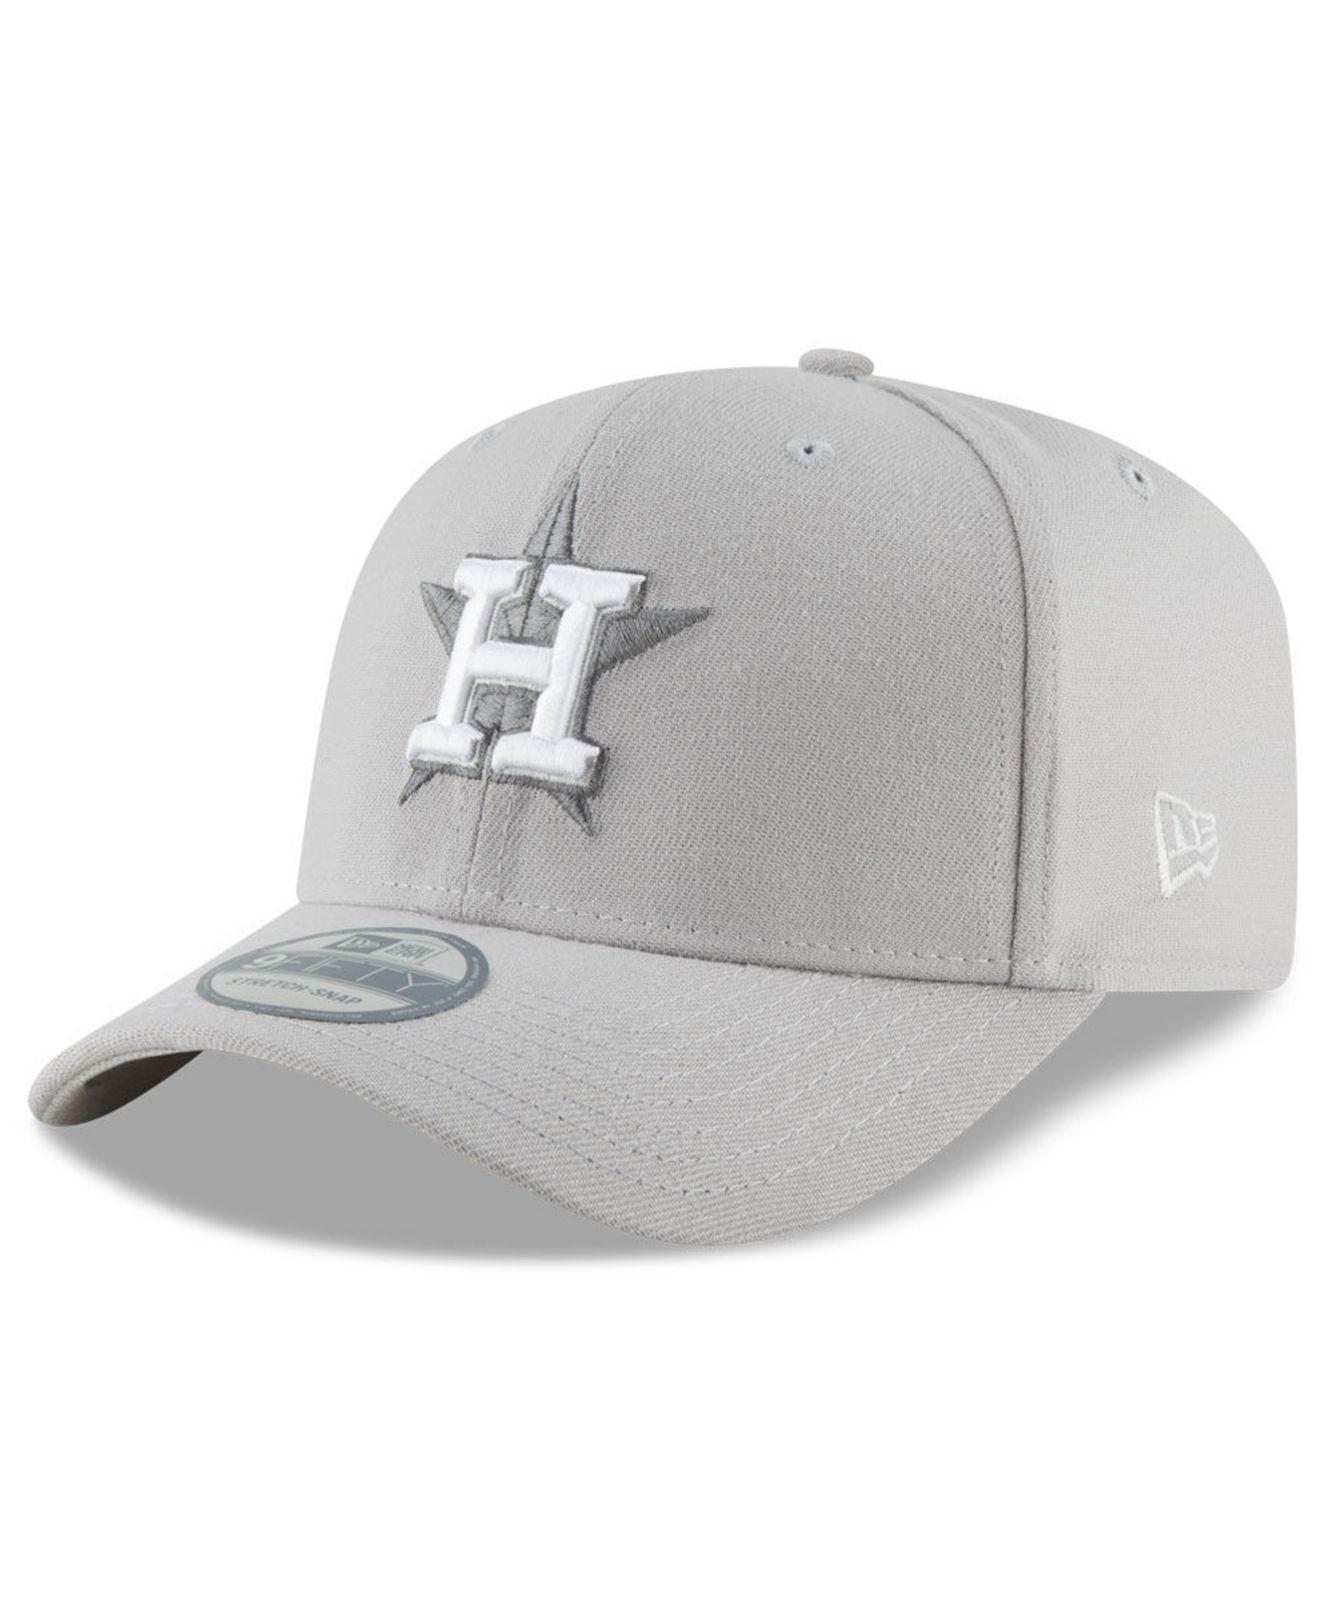 discount ktz. mens gray houston astros color prism pack stretch 9fifty  snapback cap 0a188 314f7 da934ae98f13